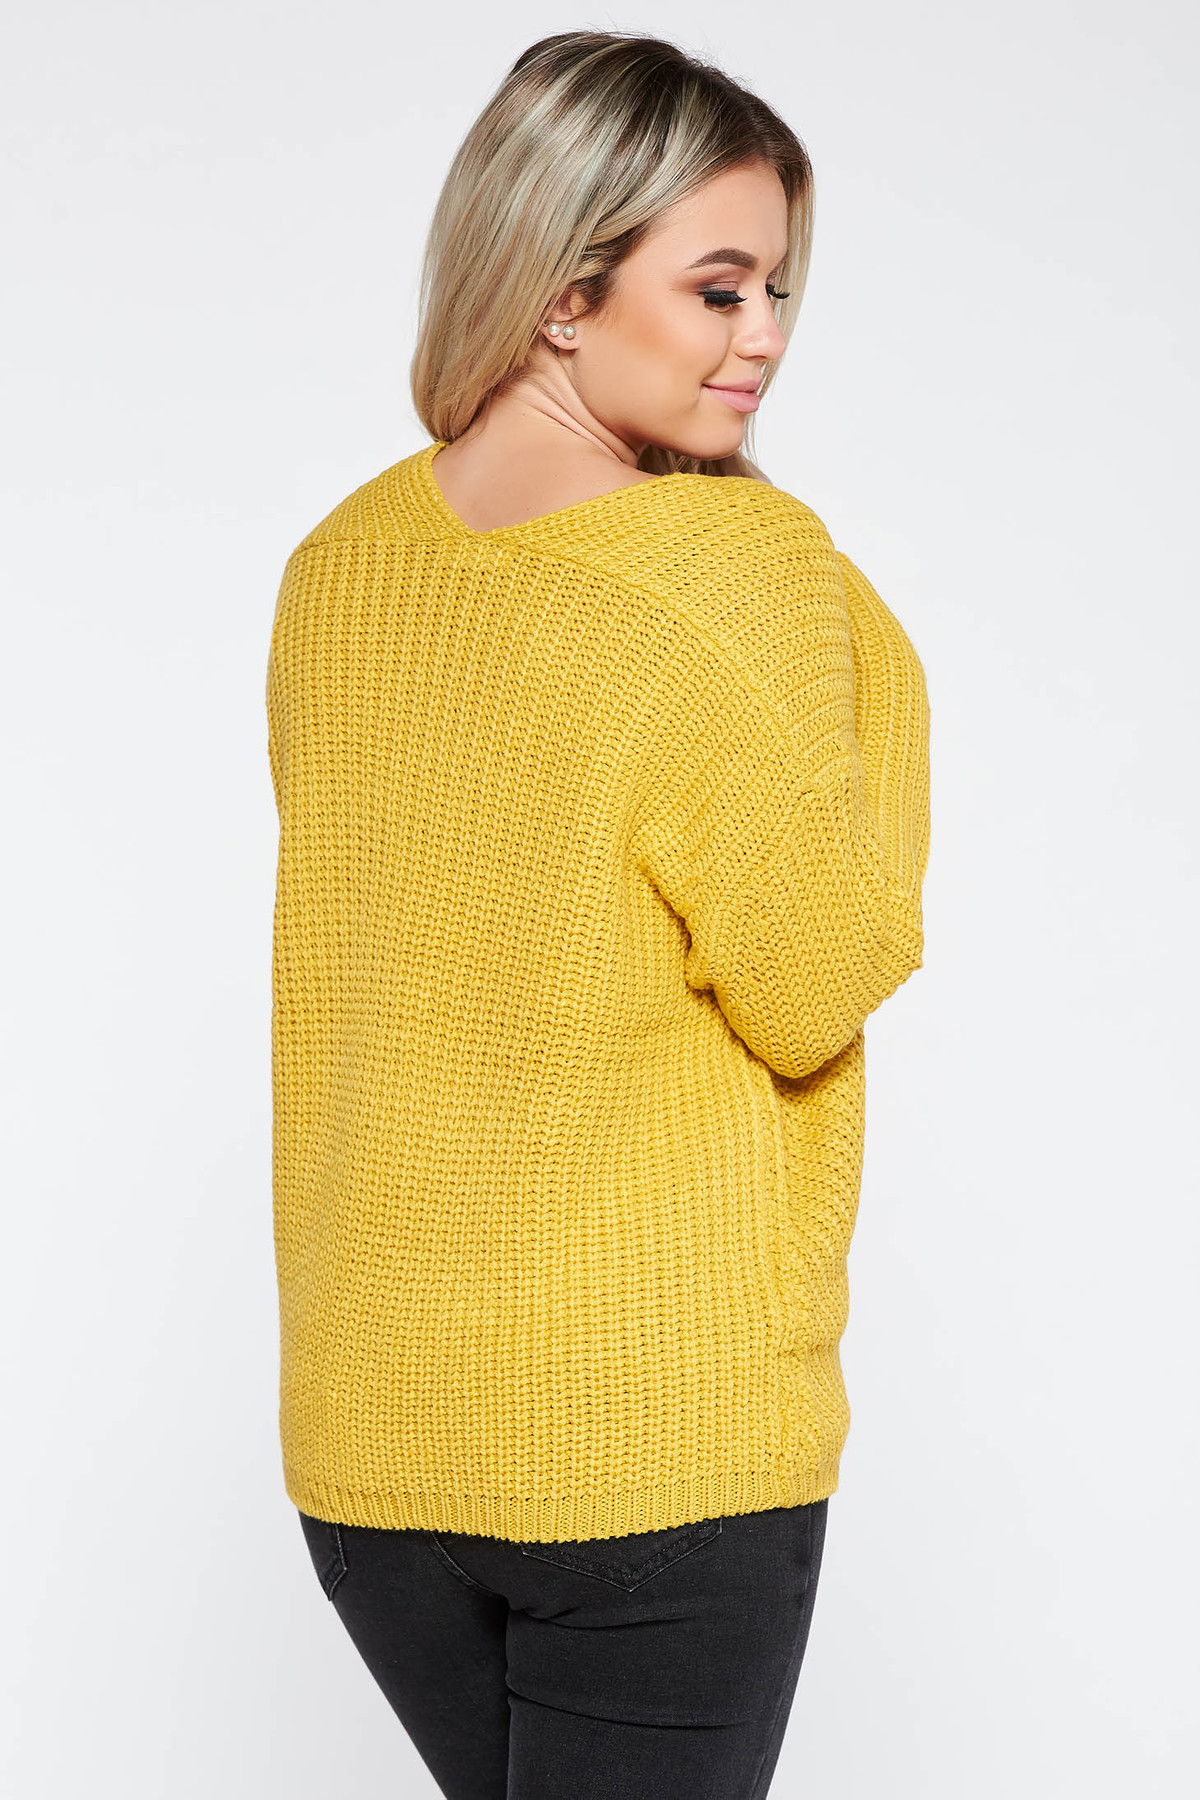 Pulover SunShine mustariu casual cu croi larg din material tricotat accesorizat cu snur